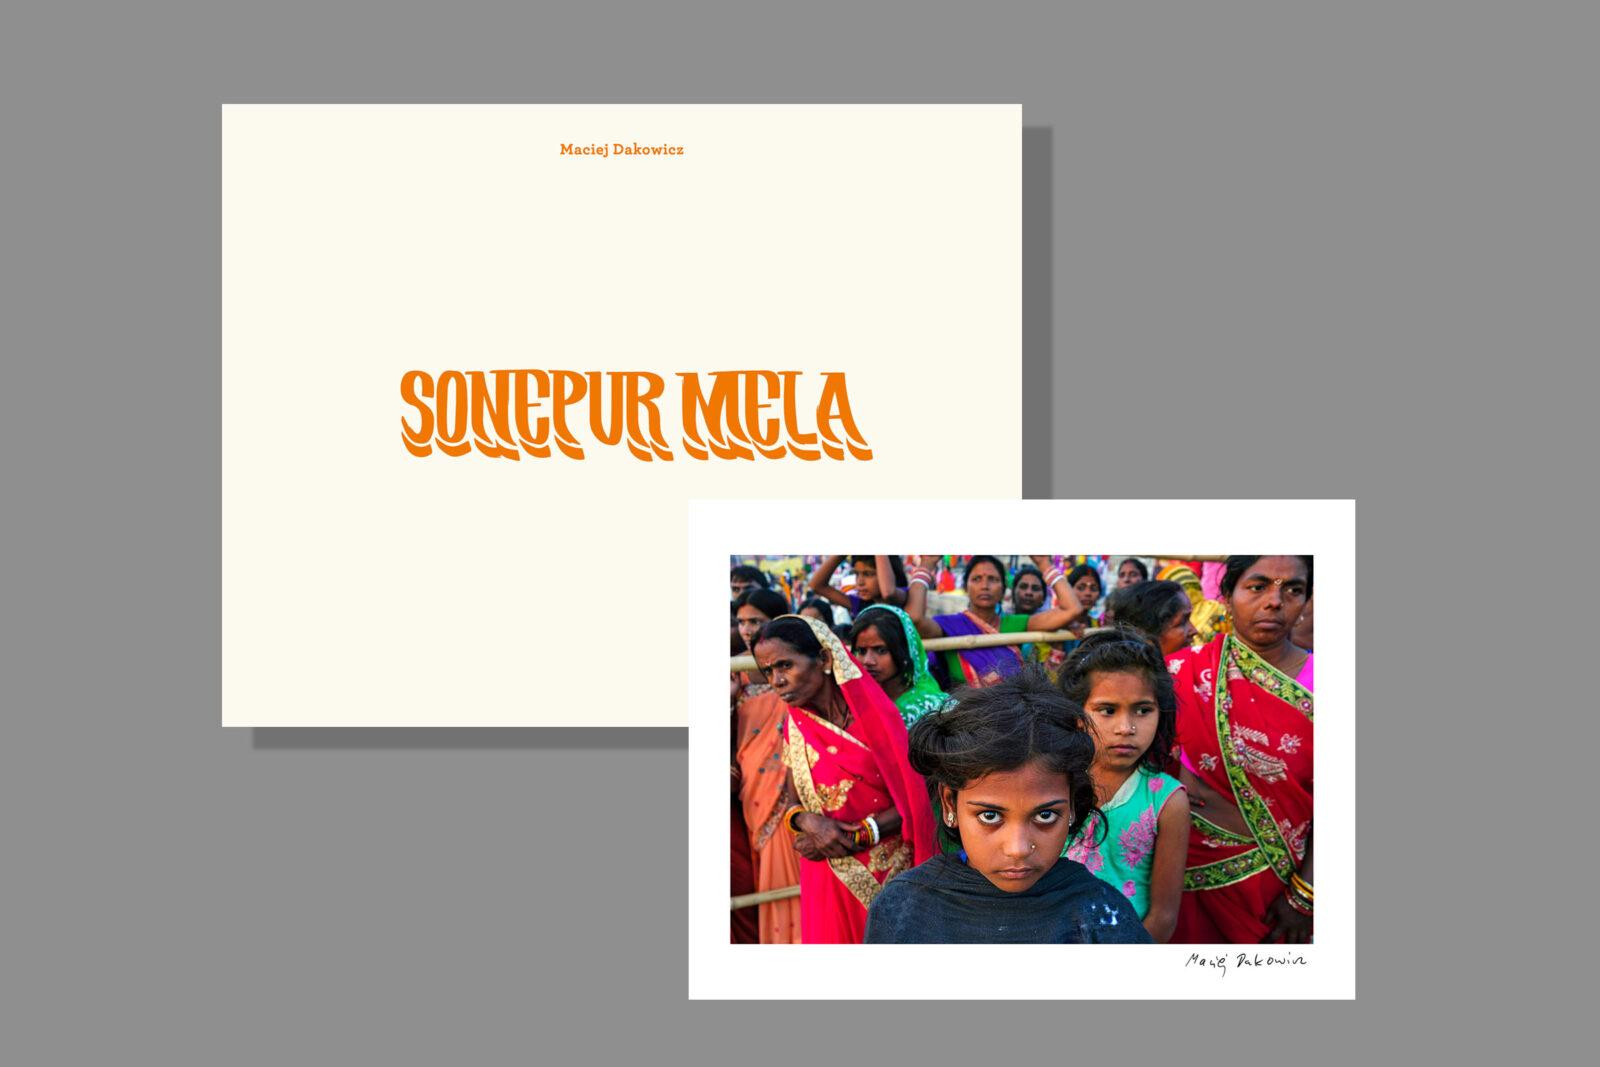 book_Sonepur_Mela_Maciej_Dakowicz_cover_special_edition_2021_orange_prints_3-1600x1067.jpg